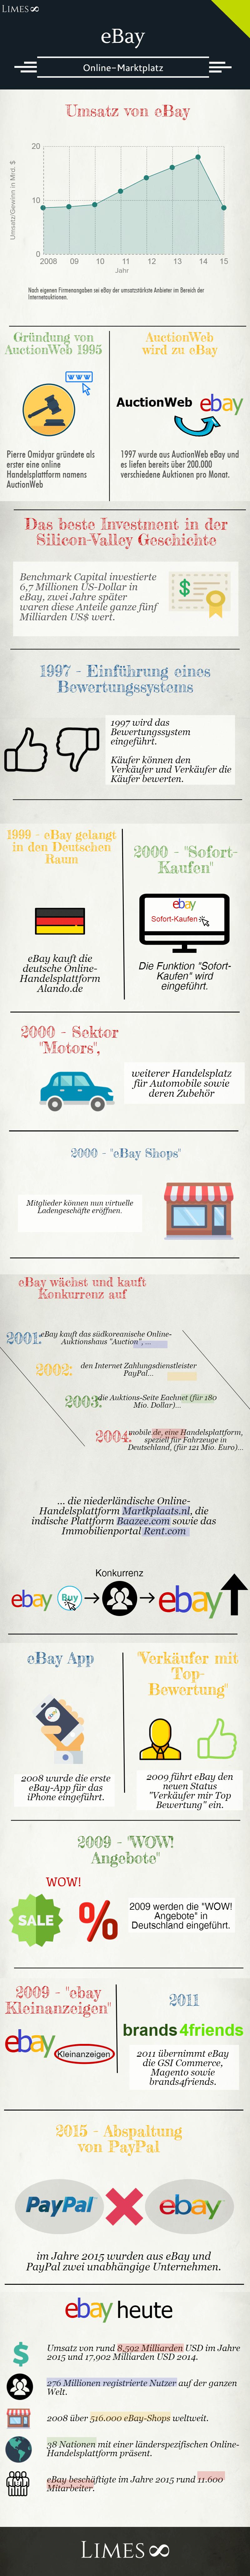 Infografik über eBay